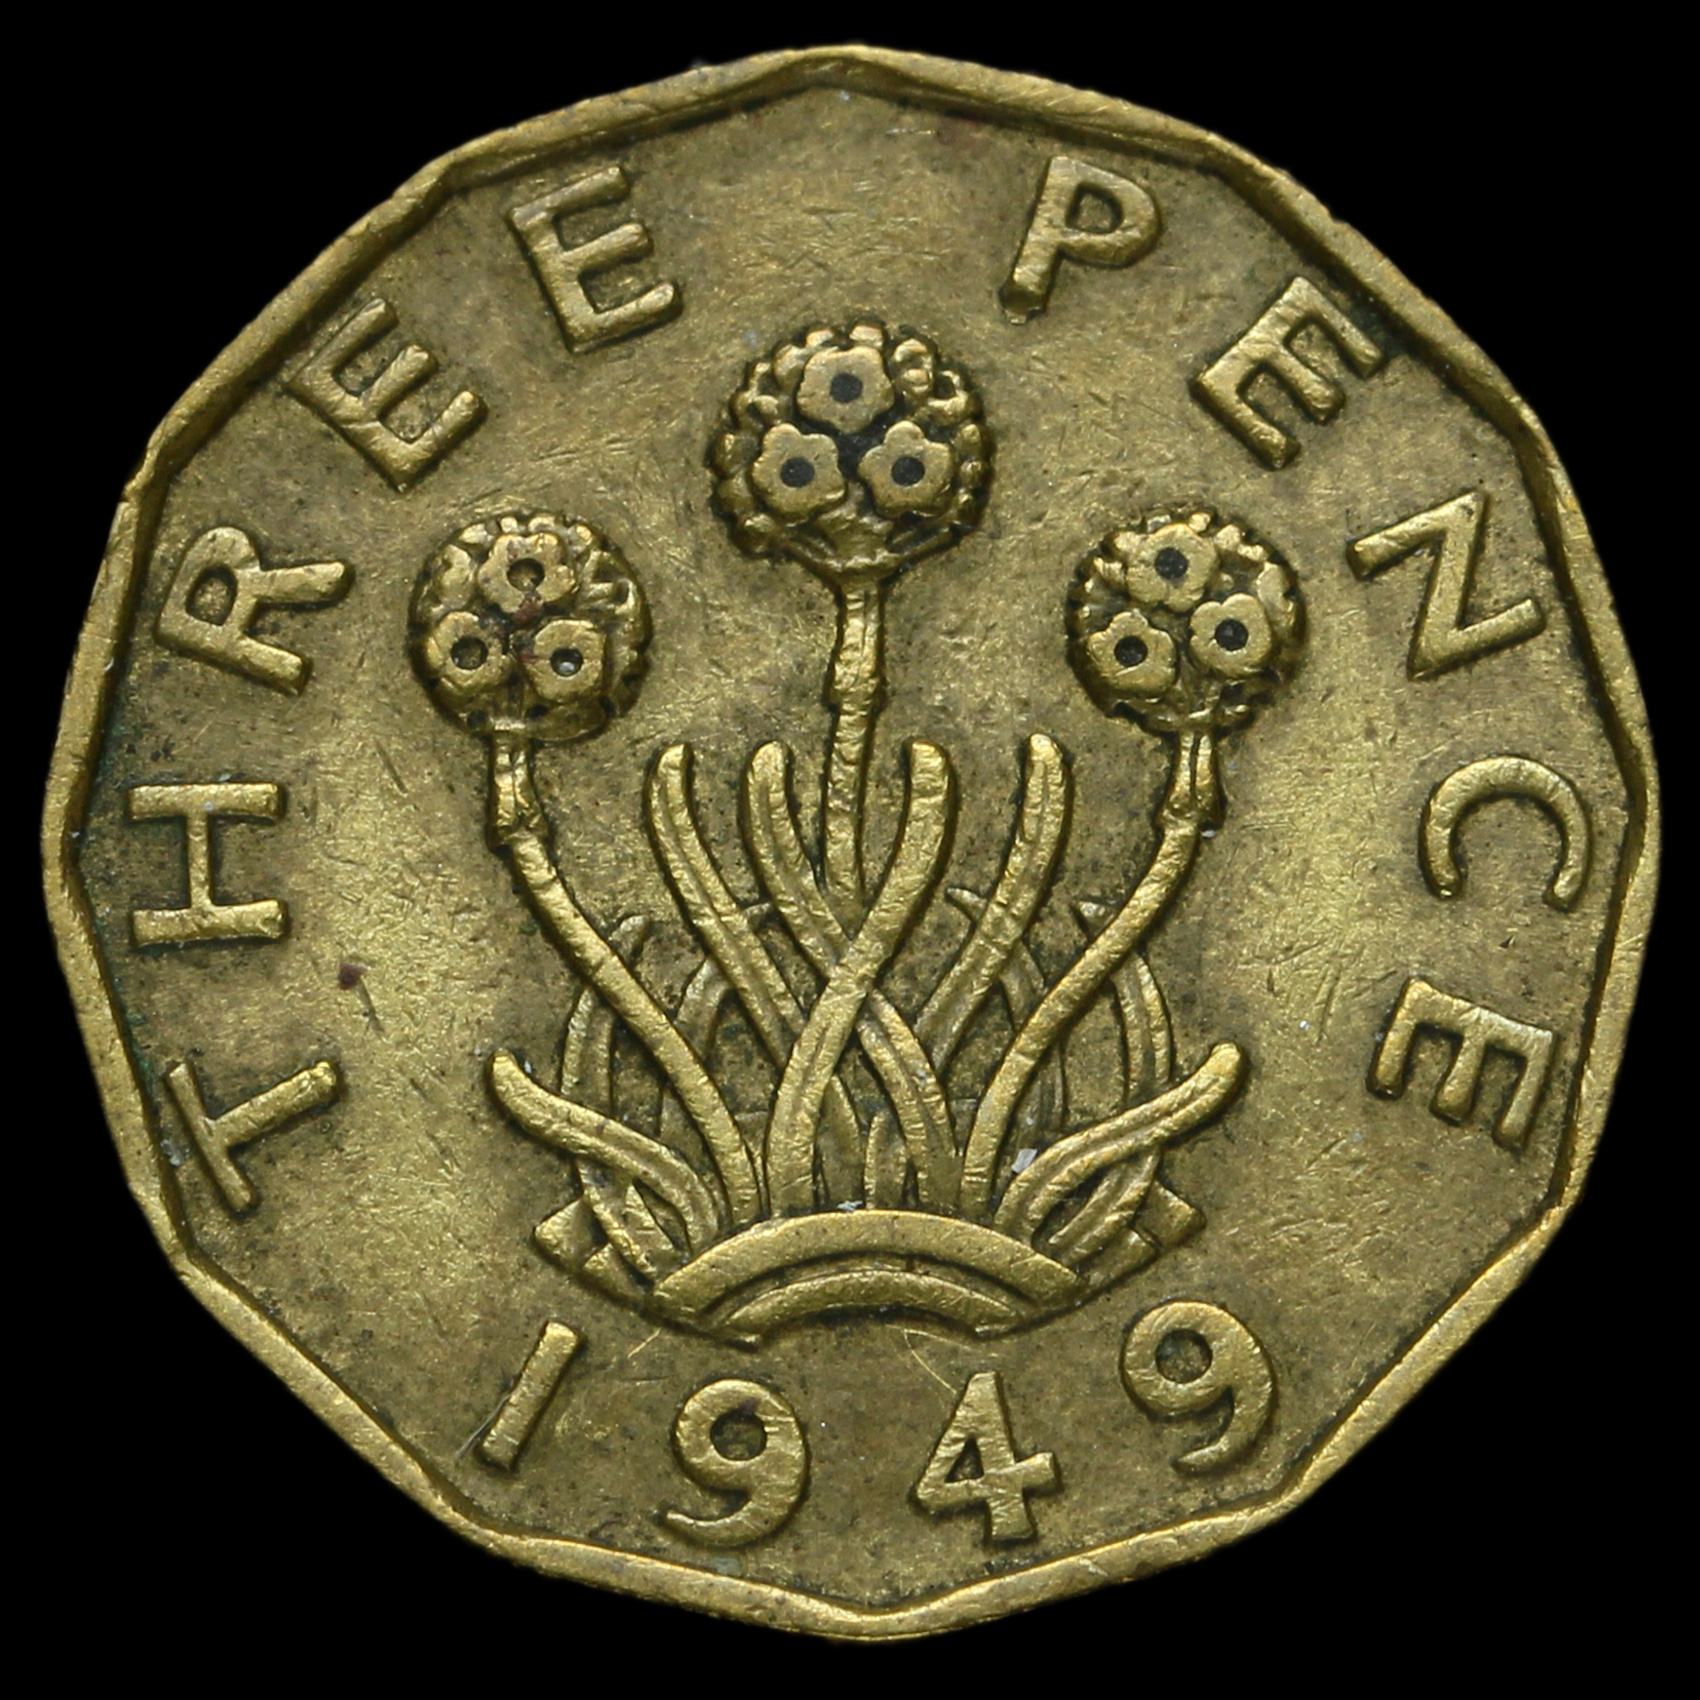 1949 George VI Brass Threepence, Rare, AVF